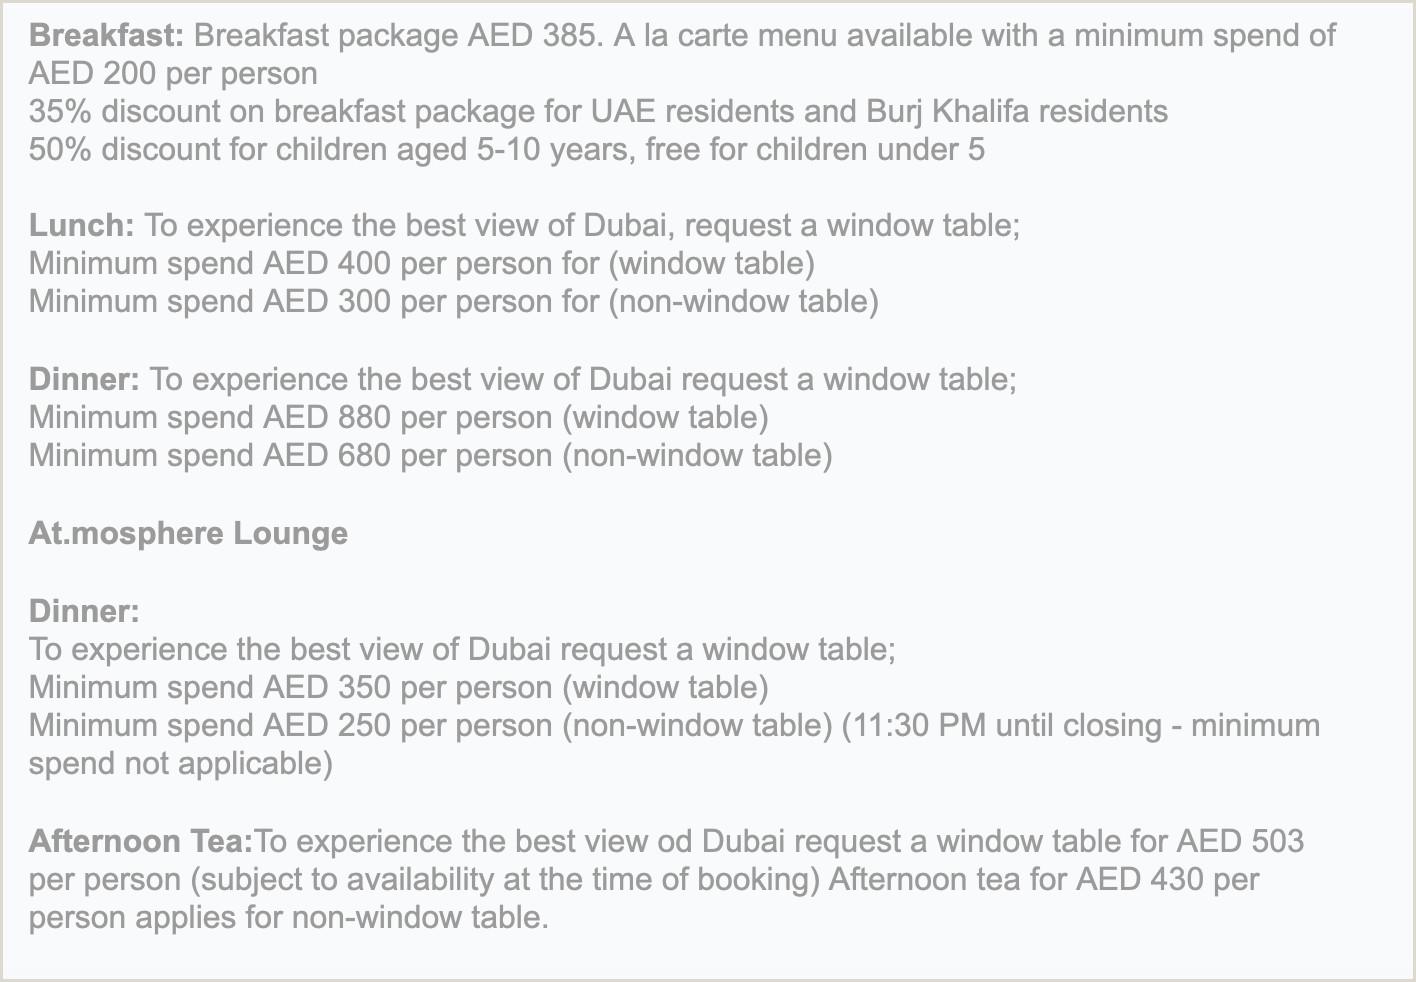 Dining at Atsphere Atop the Burj Khalifa in Dubai